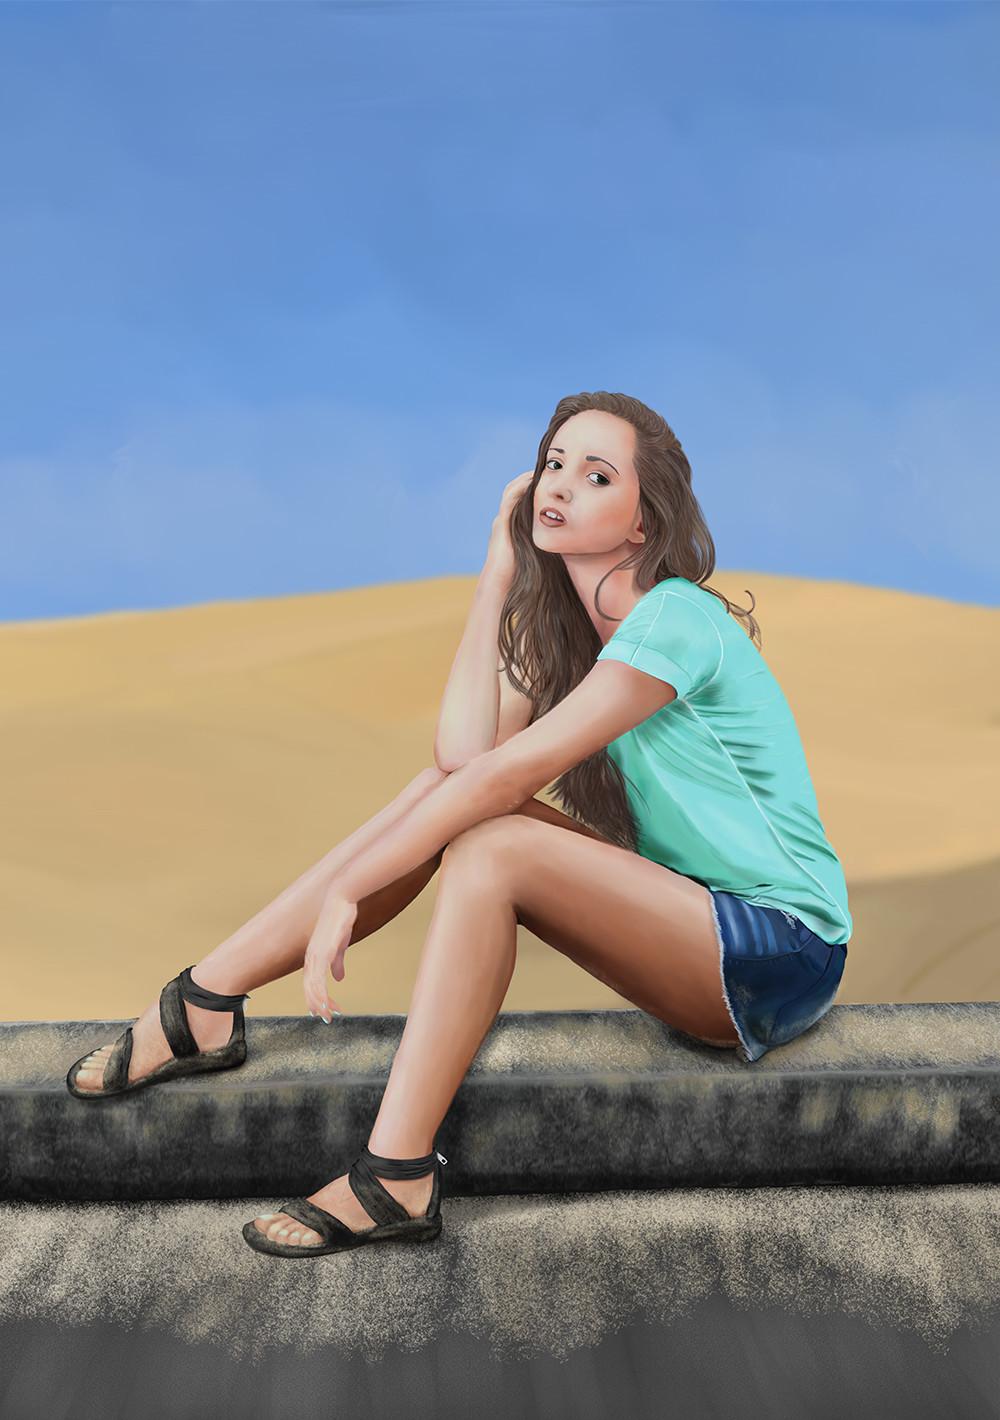 Brinjen russell summer at the beach web size